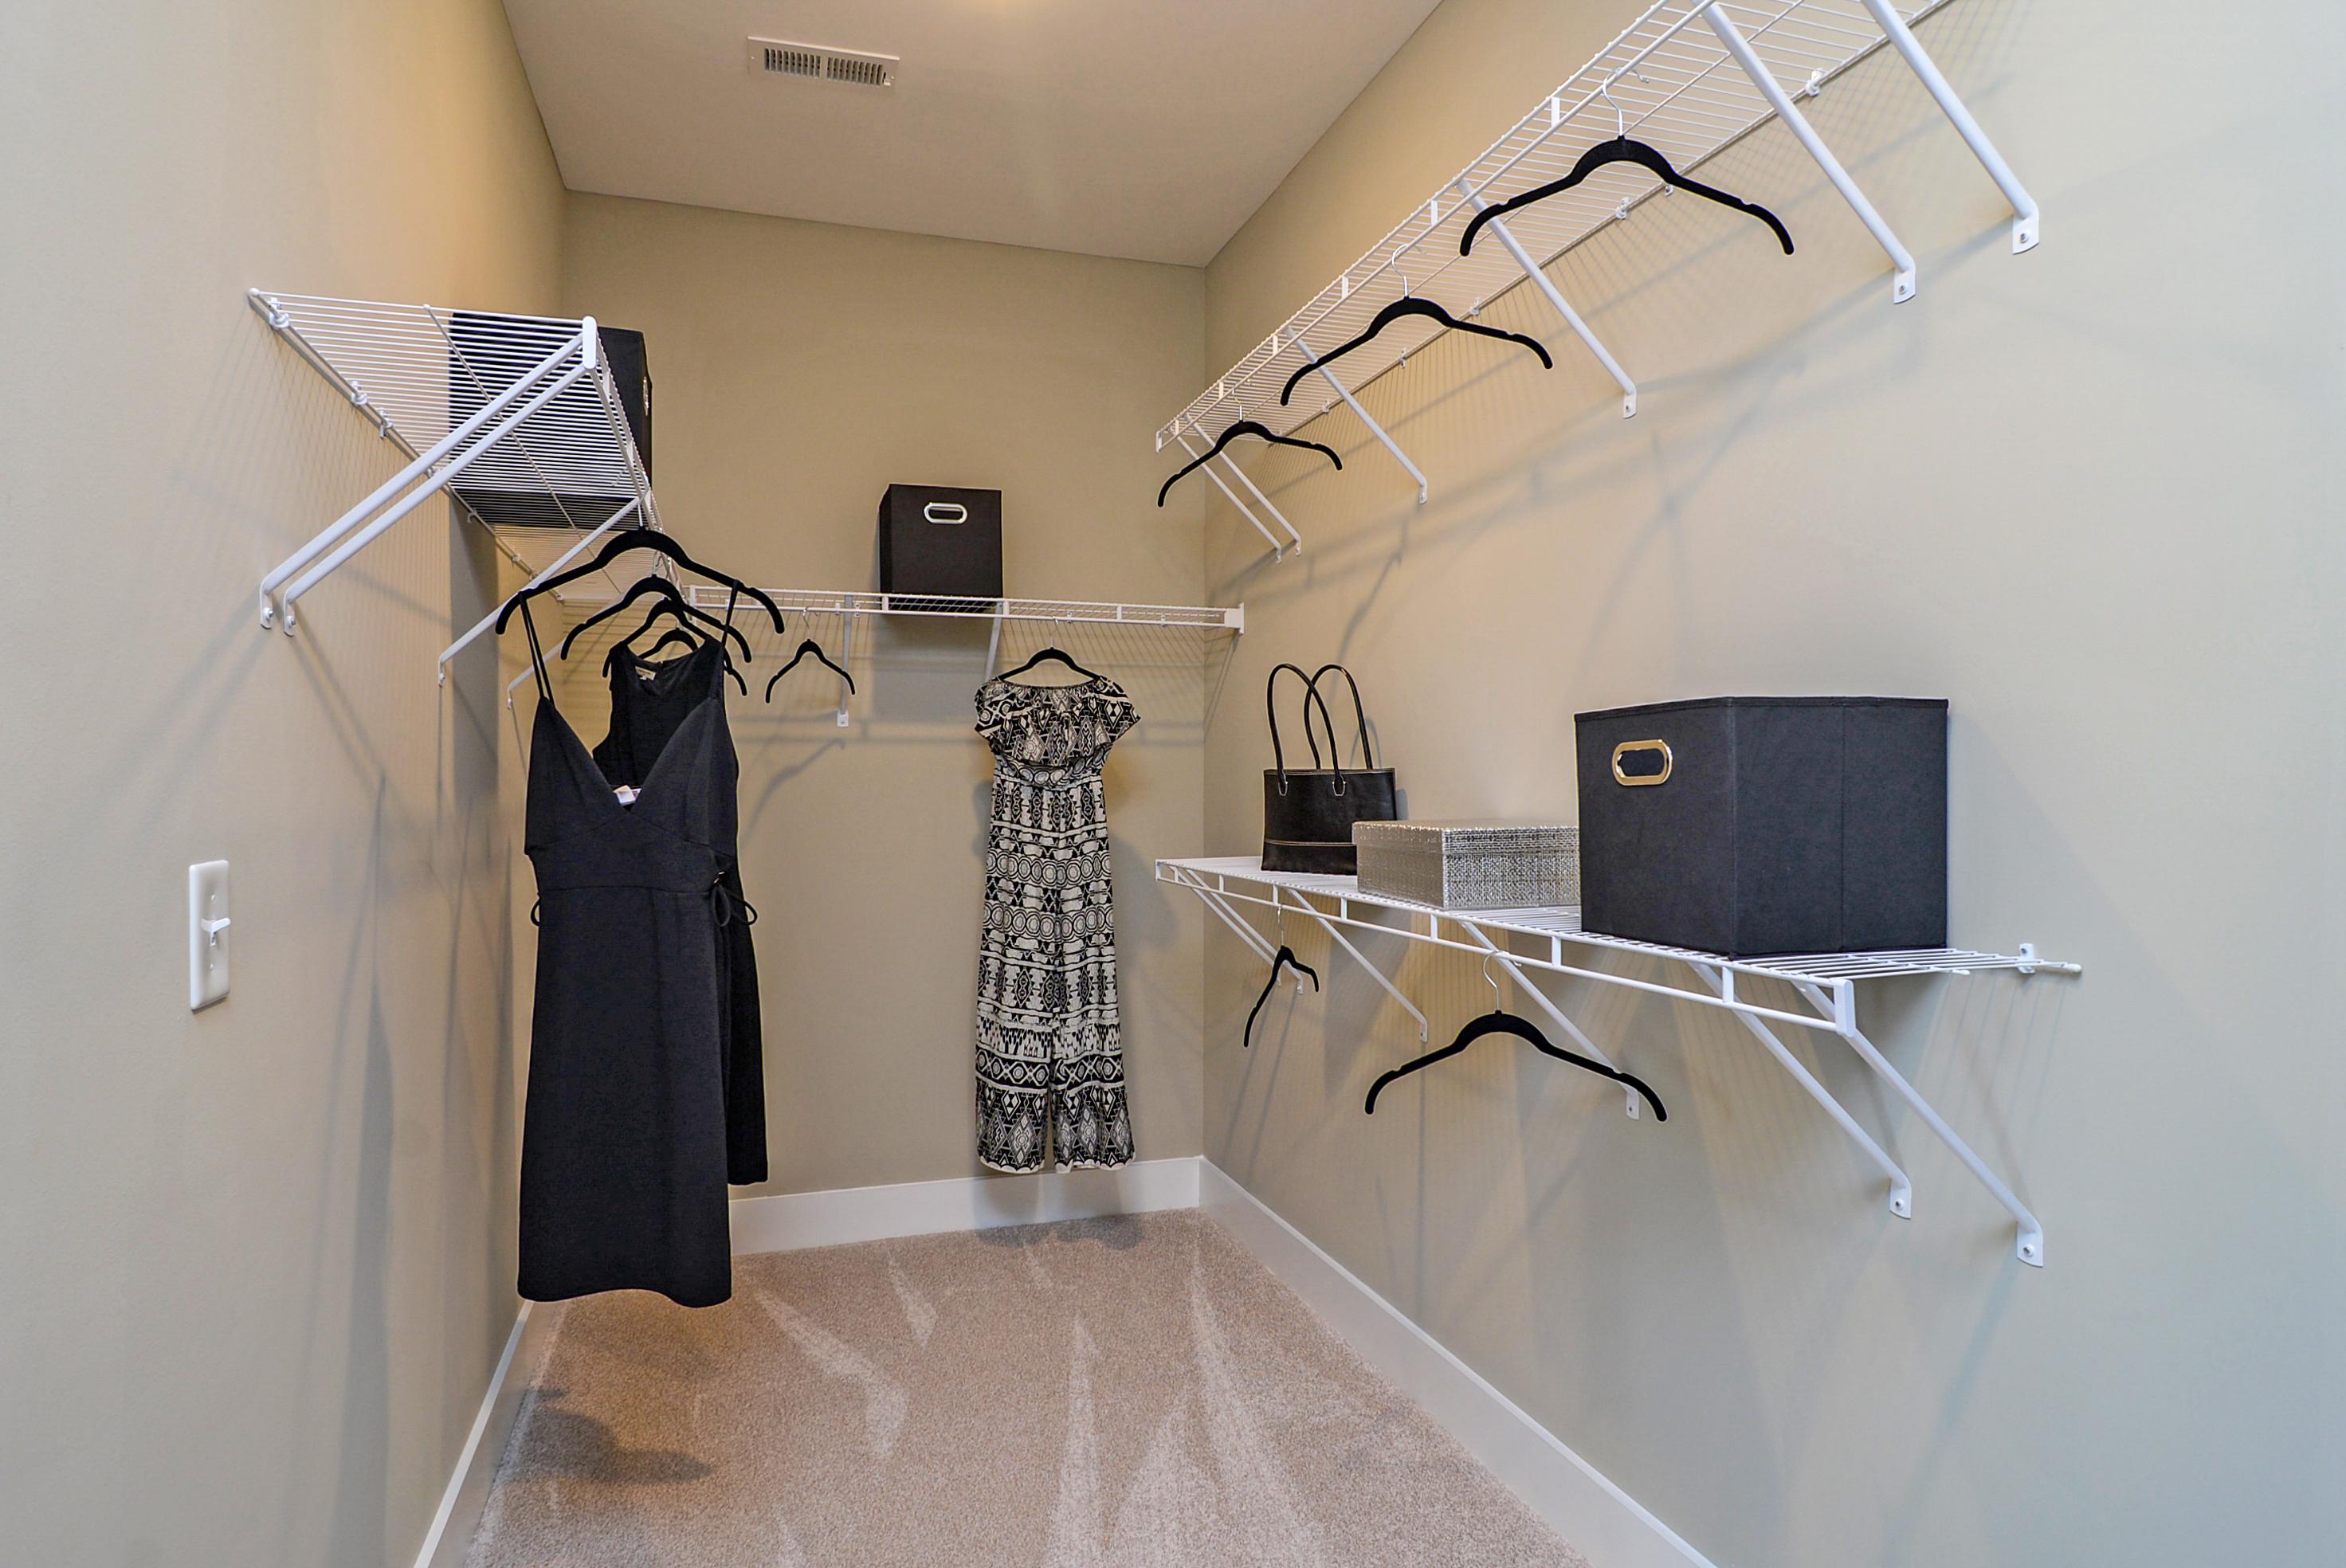 m-closet-1b_48689376198_o.jpg